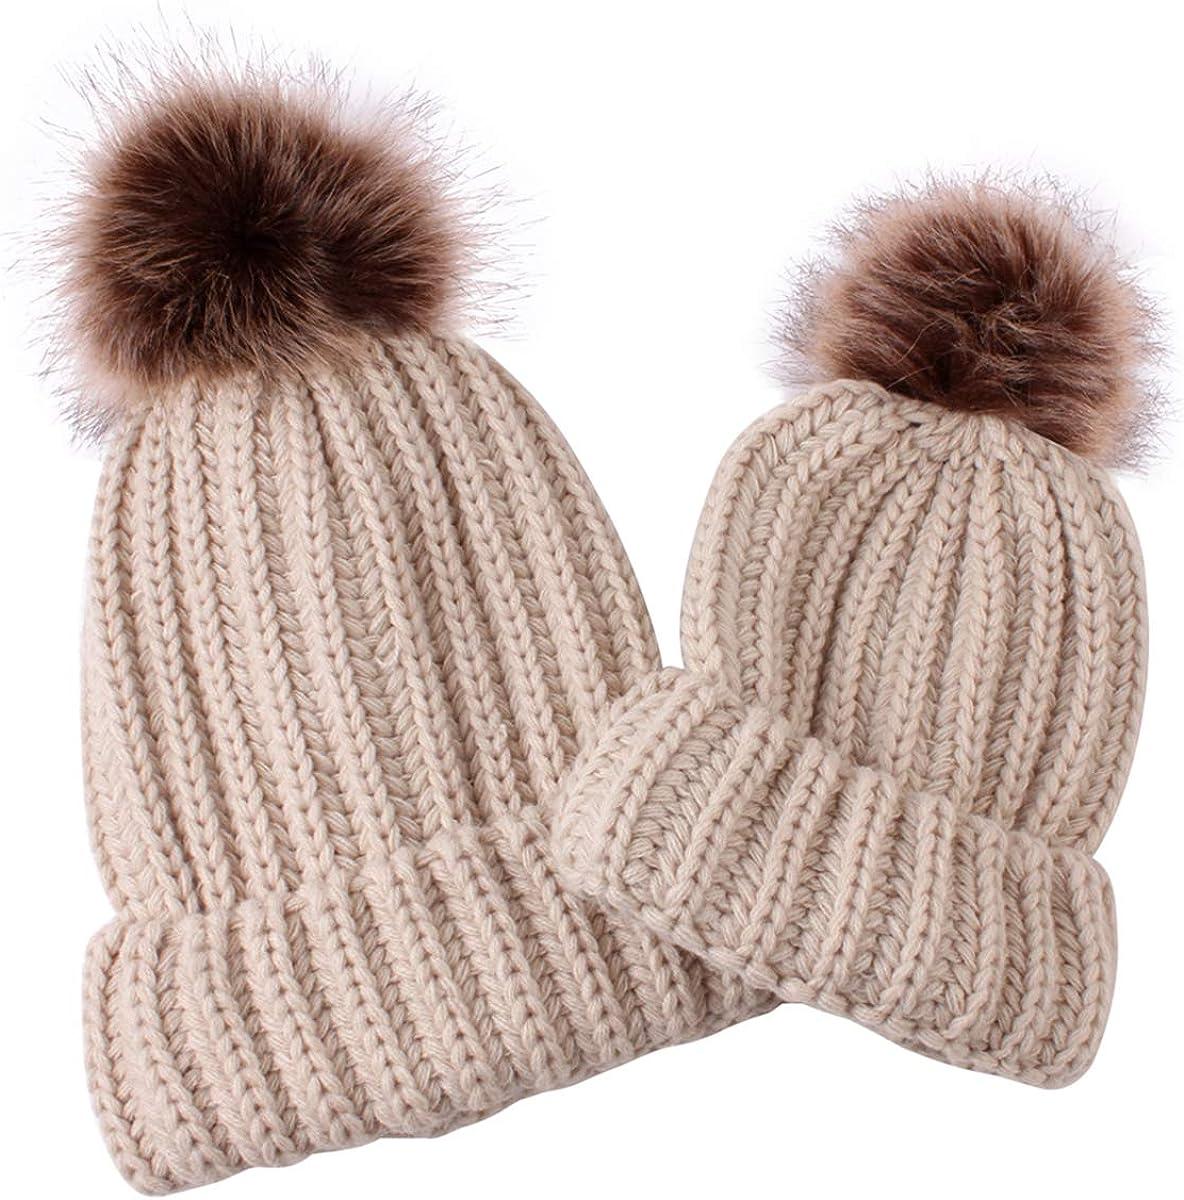 2PCS Men Womens Kids Baby Winter Warm Knit Crochet Slouch Beanie Hat Ski Cap Set